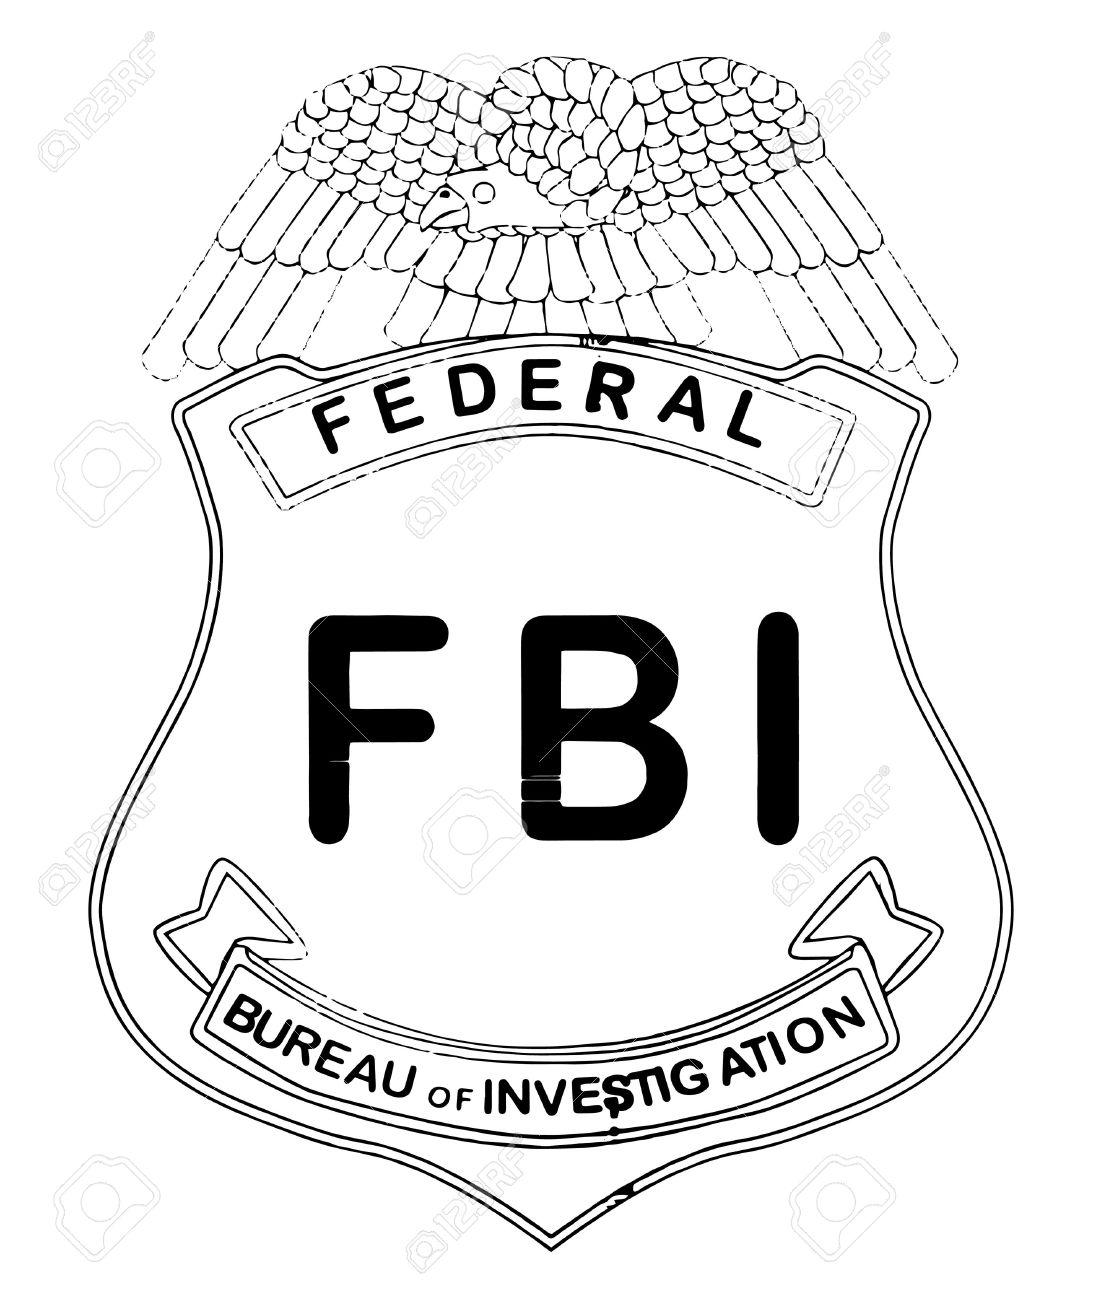 Fbi Clipart